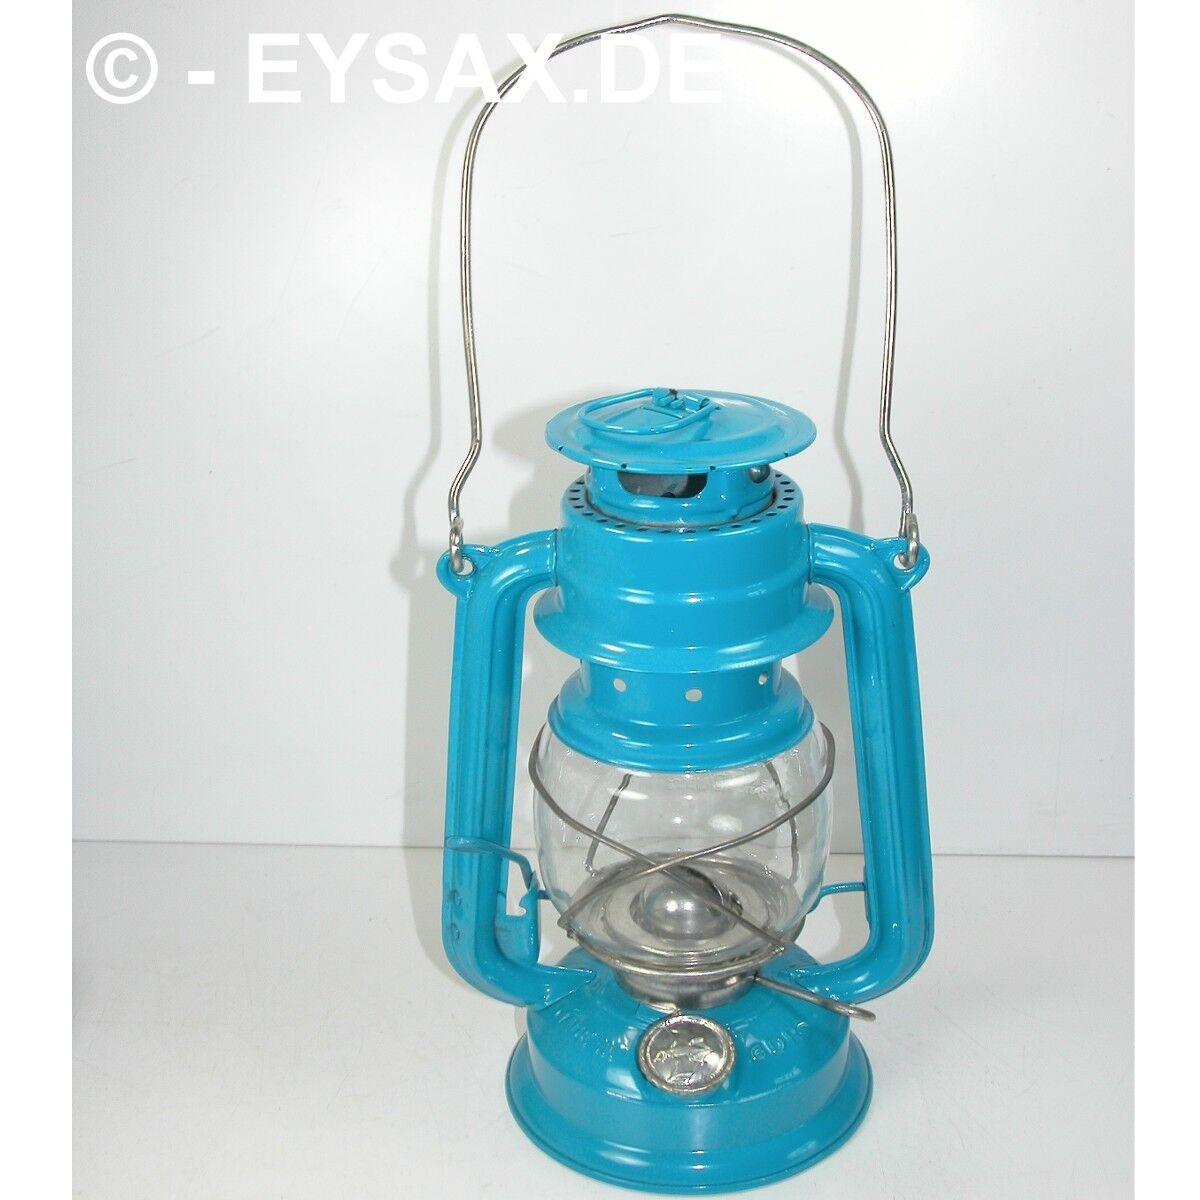 Original DDR BAT Petroleumlampe Sturmlaterne No158 5 incl.Fledermaus FARBE BLAU  | Ermäßigung